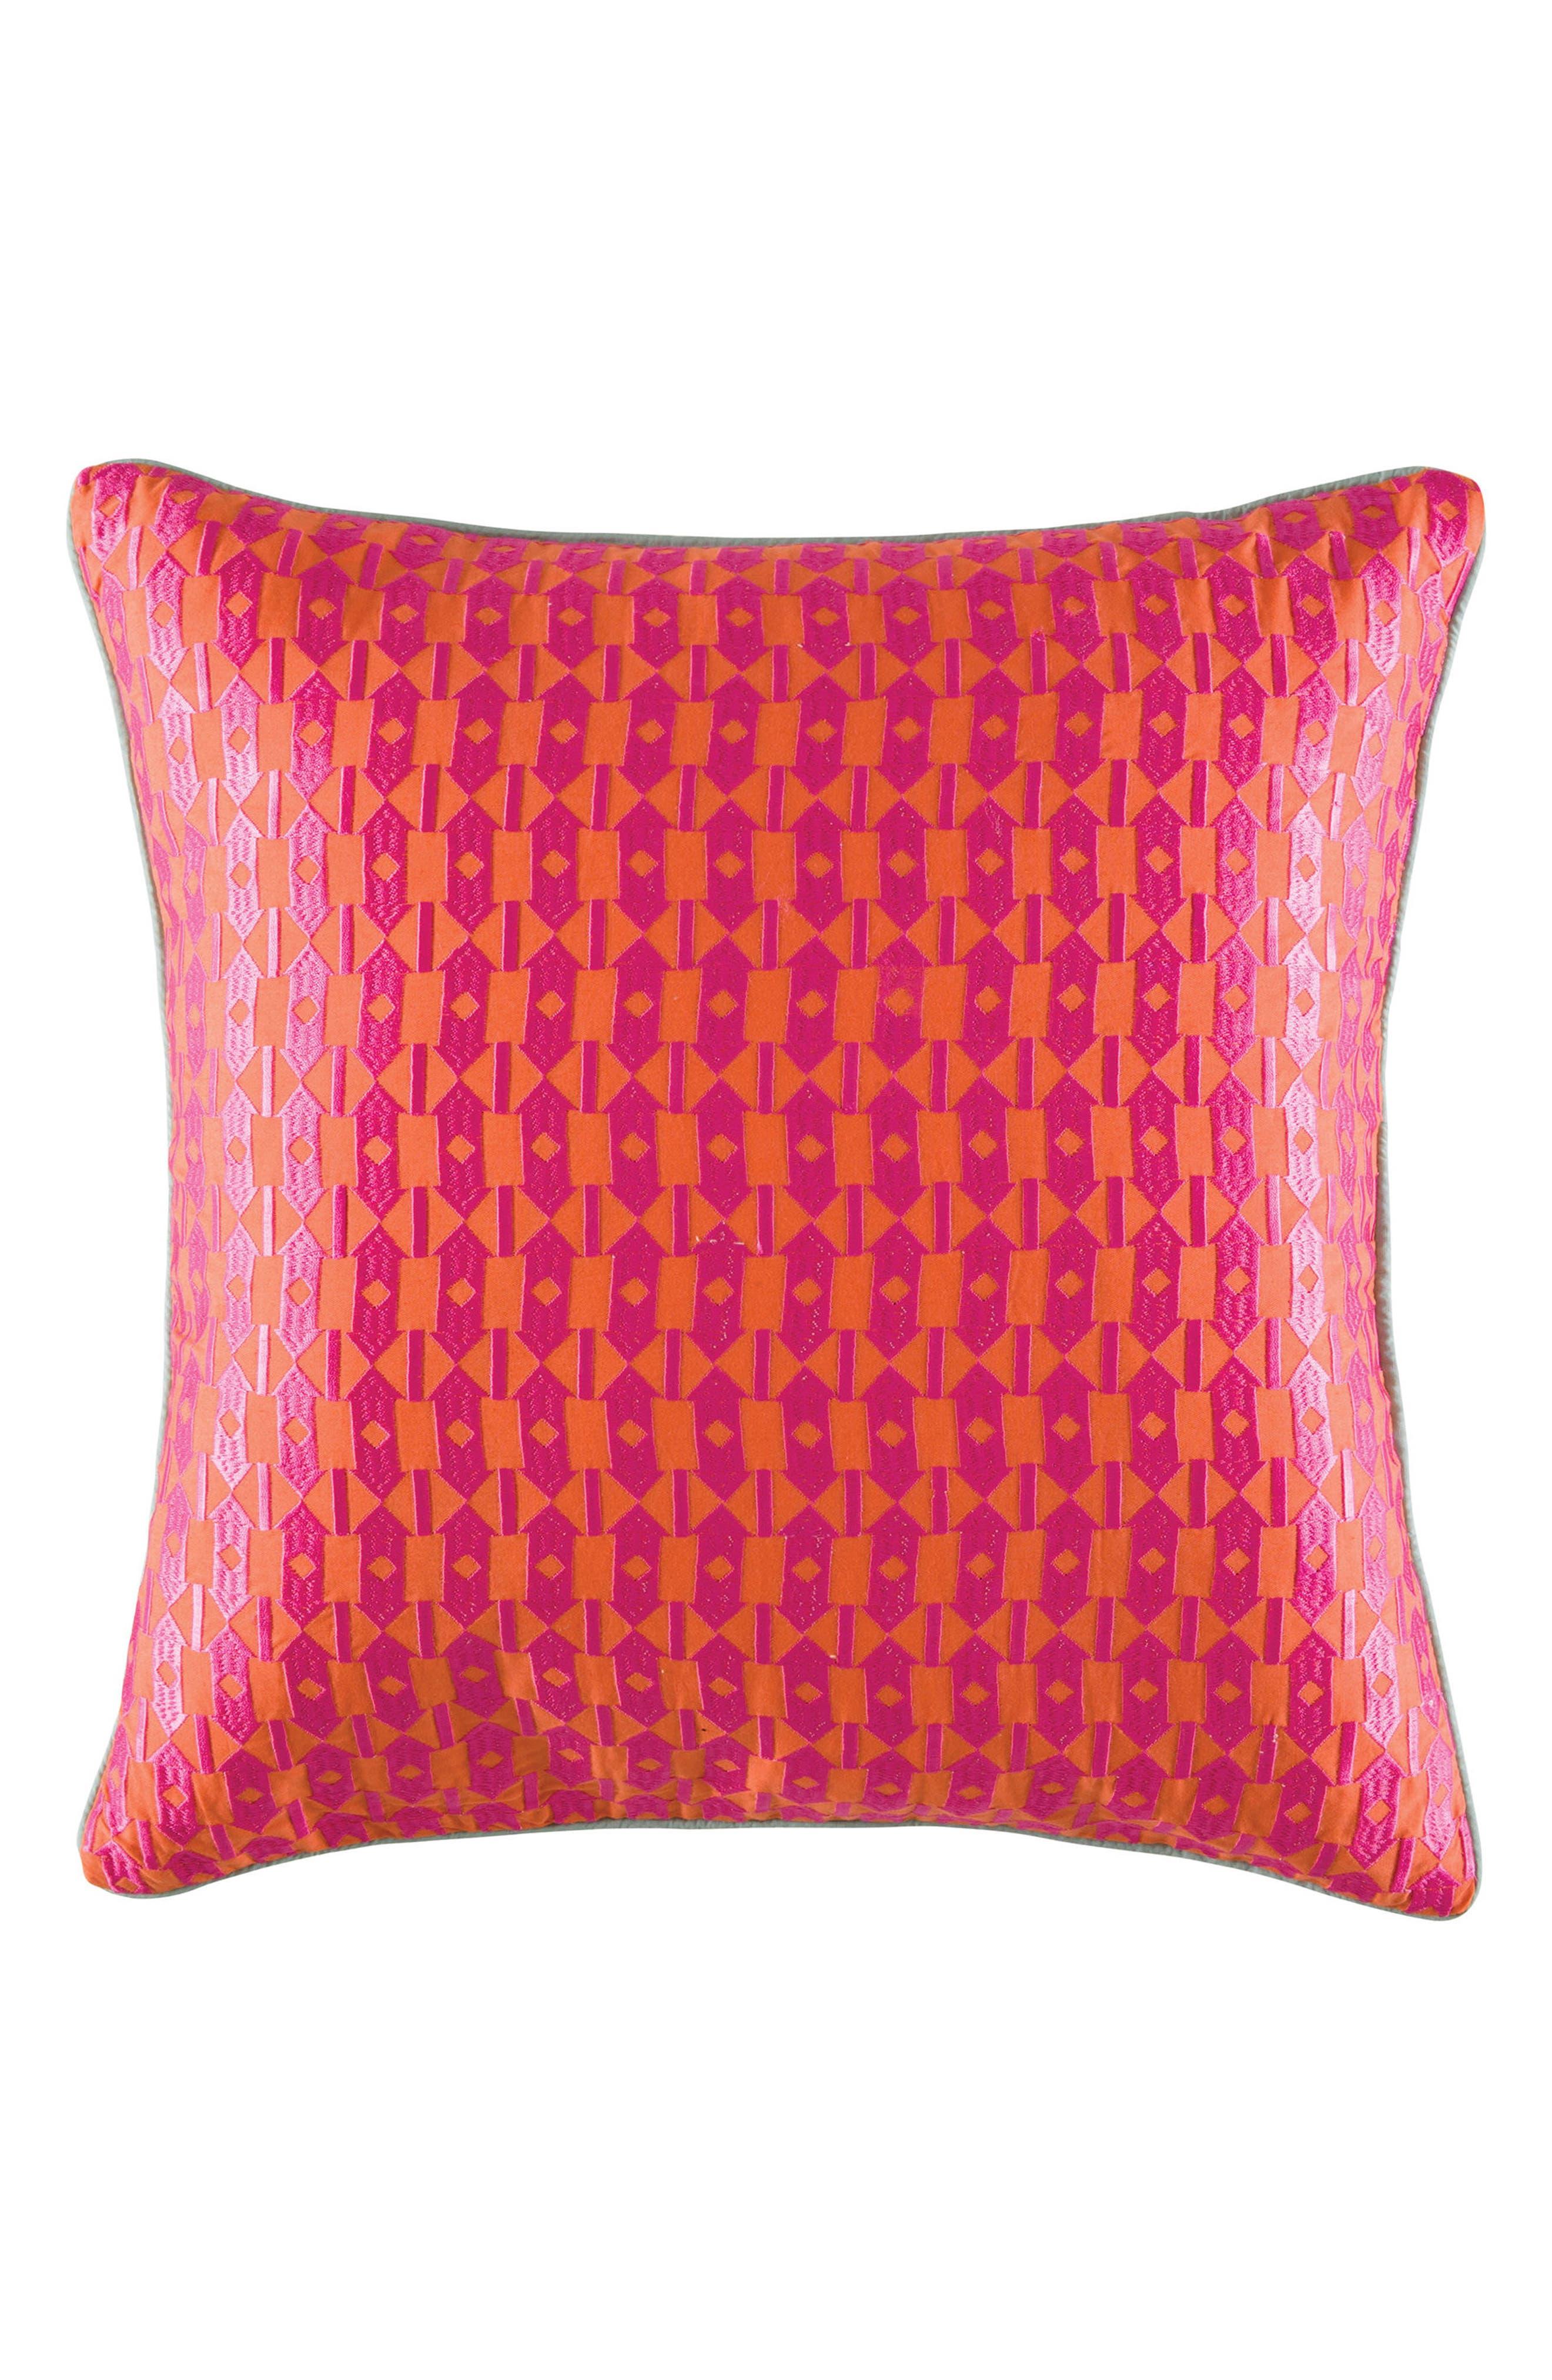 Alternate Image 1 Selected - KAS Designs Grenda Pillow